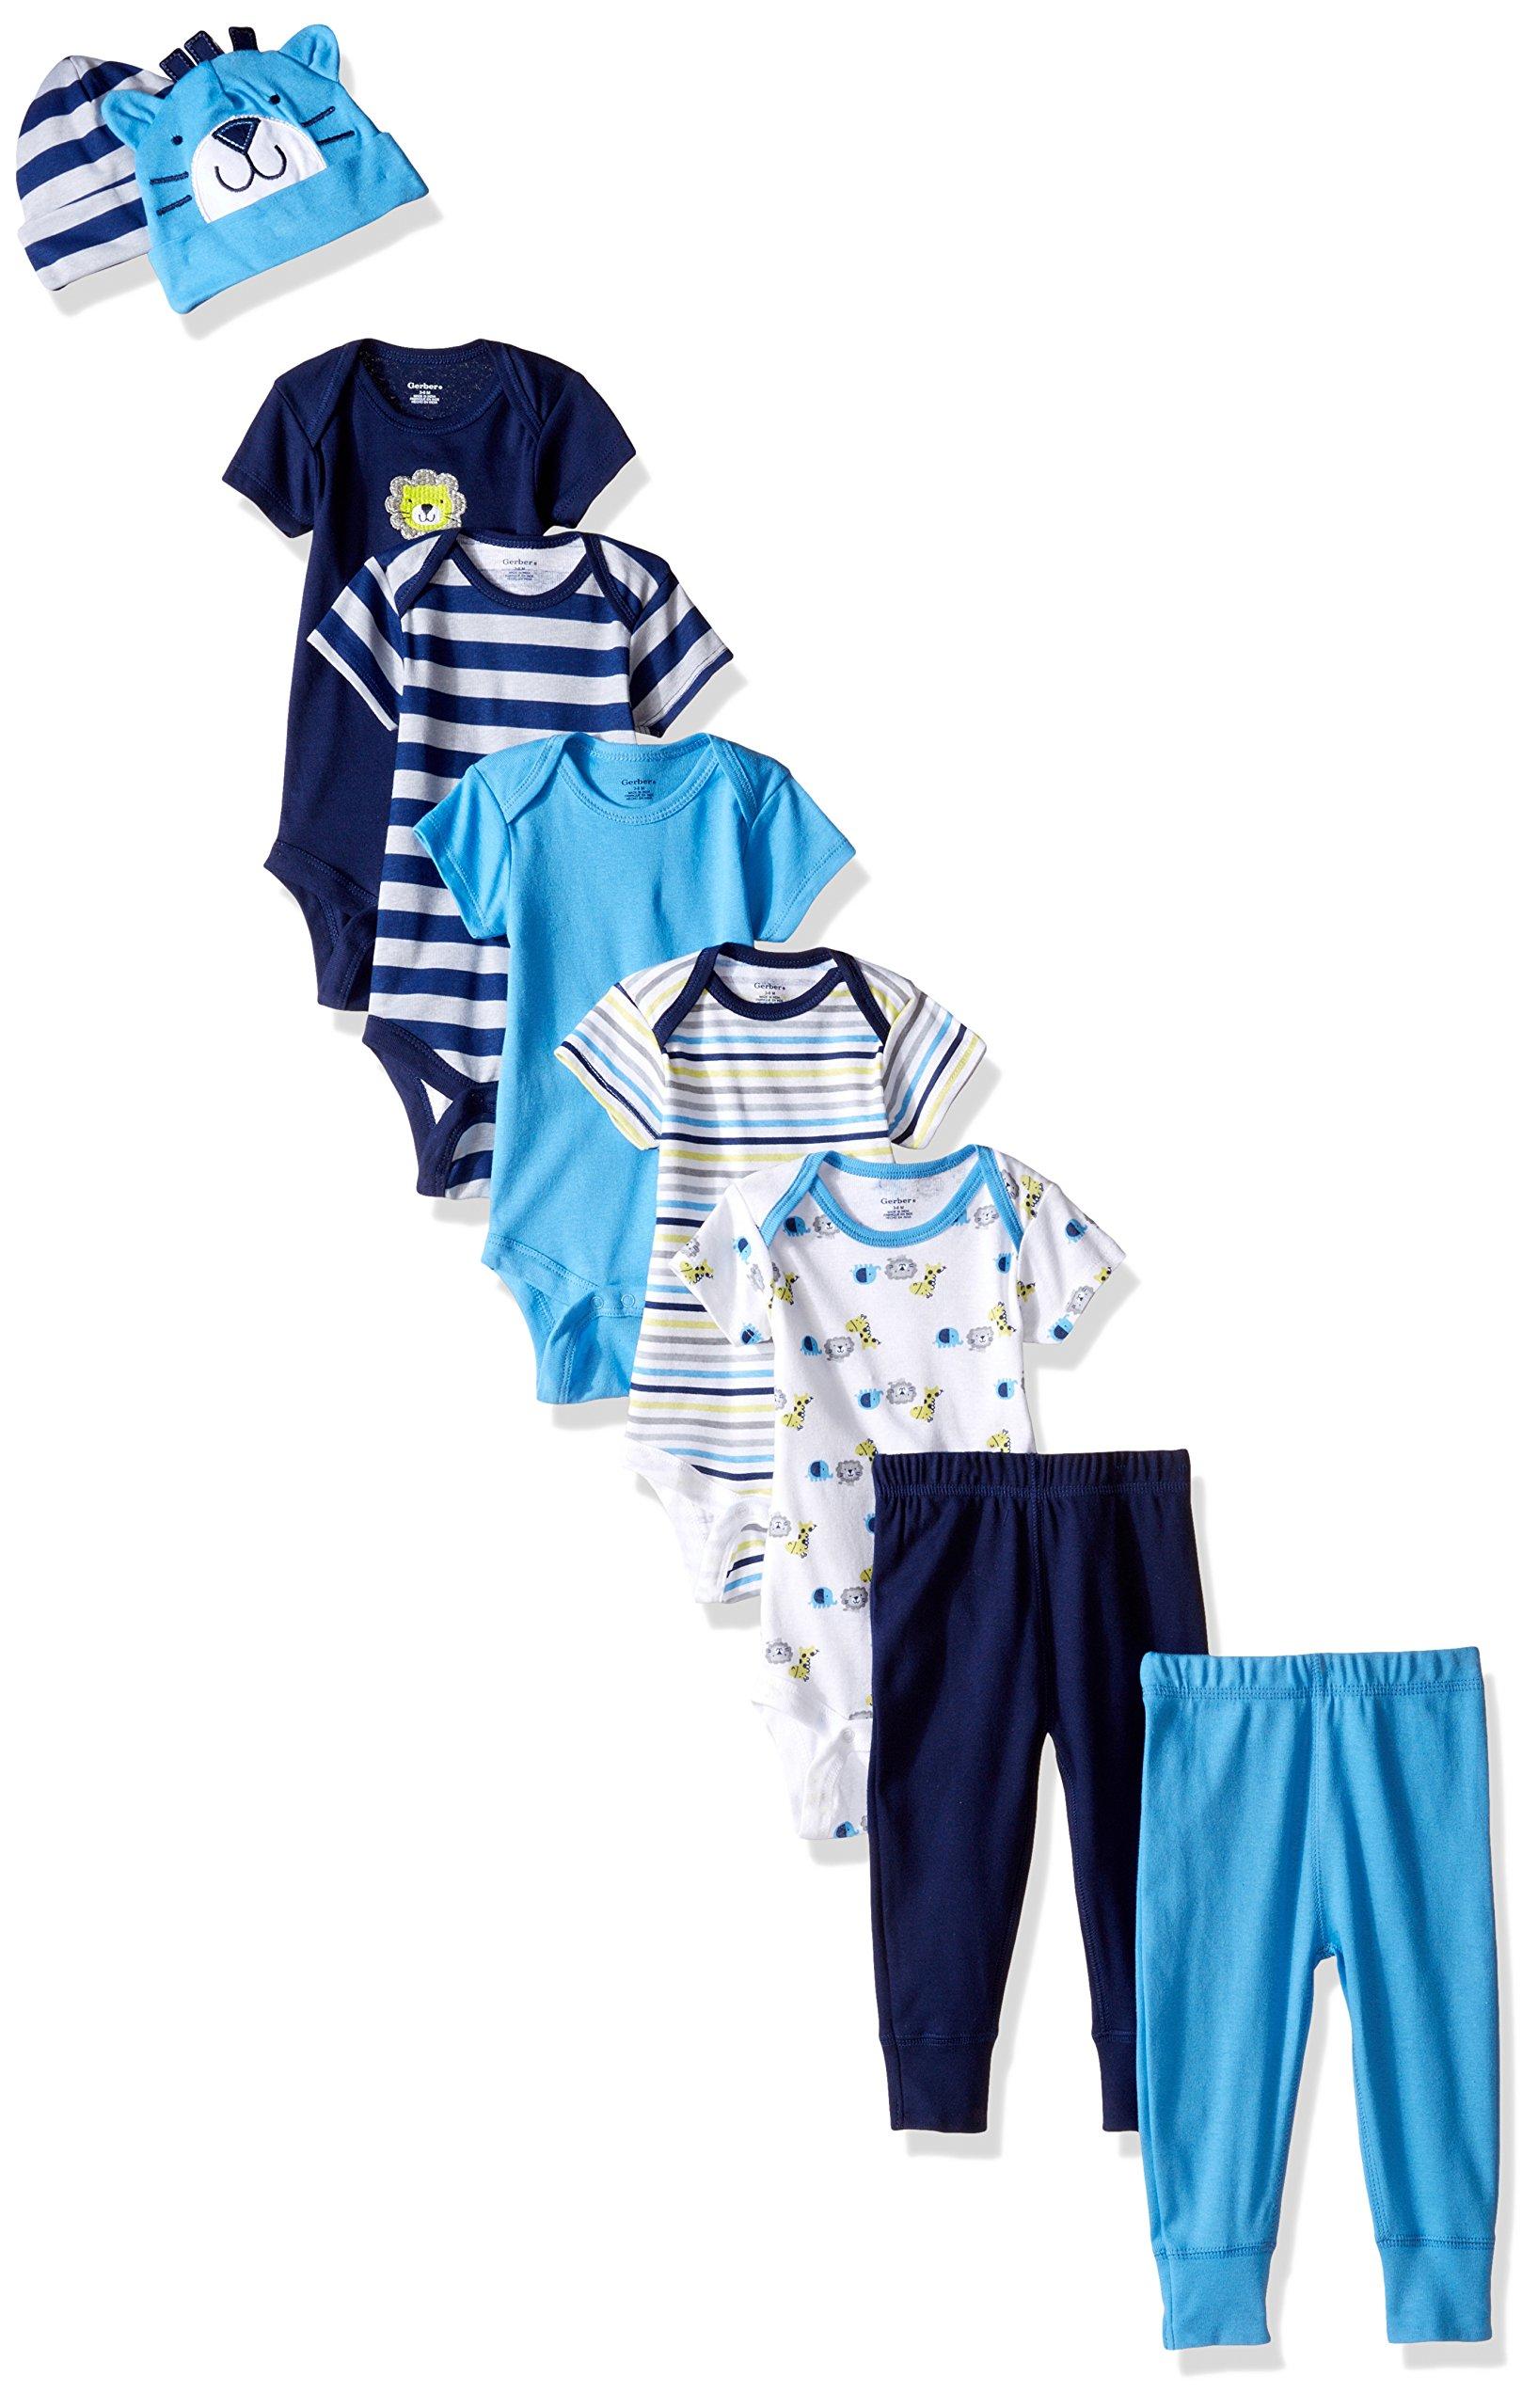 Gerber Baby Boys' 9 Piece Playwear Bundle, Safari, Onesies/Pant 3-6M, Cap 0-6M